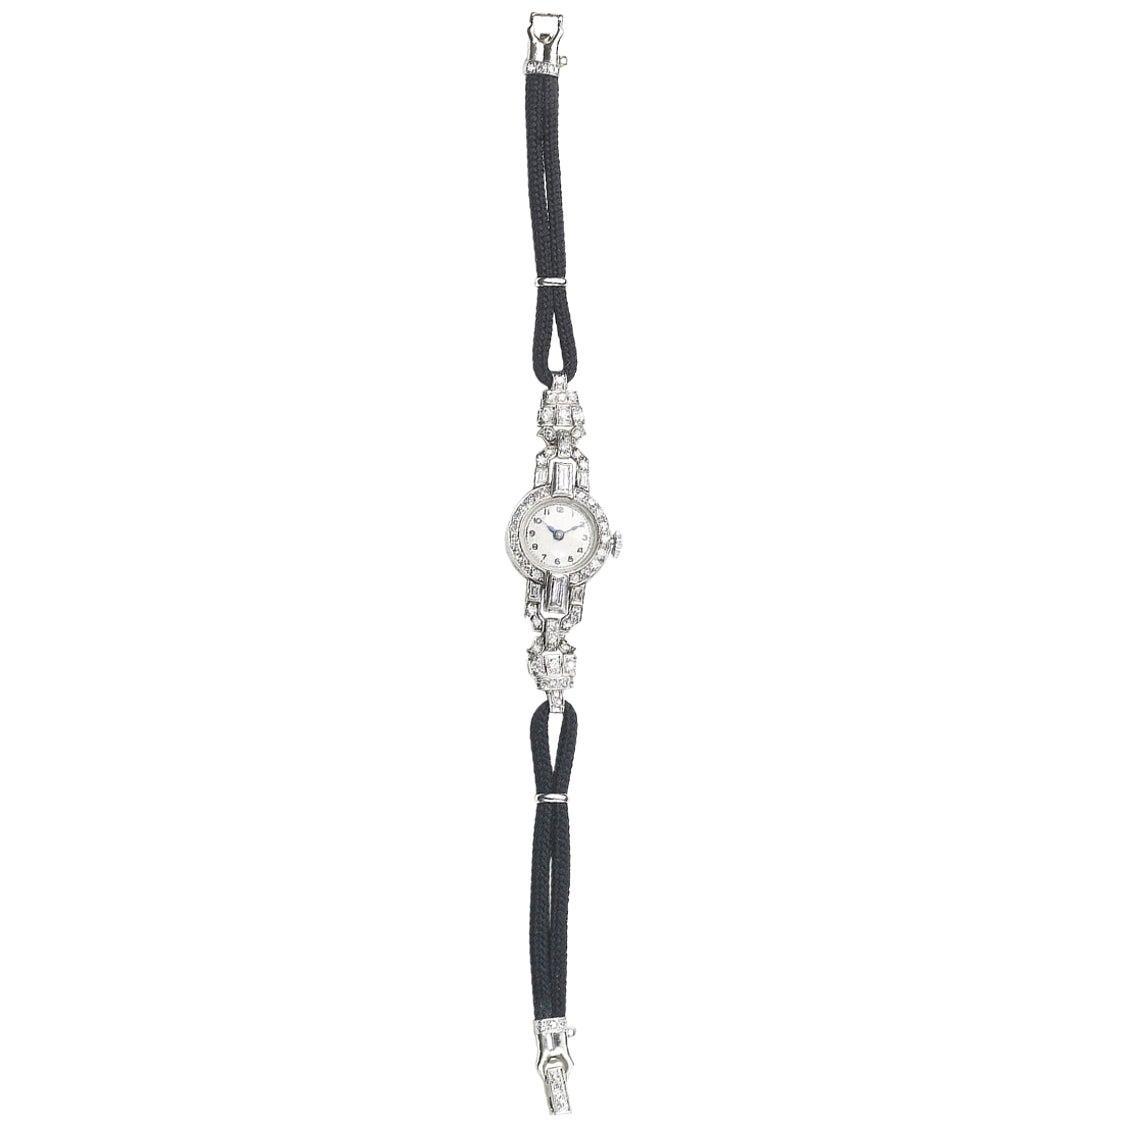 Art Deco Diamond and Platinum Cocktail Manual Wristwatch, circa 1930